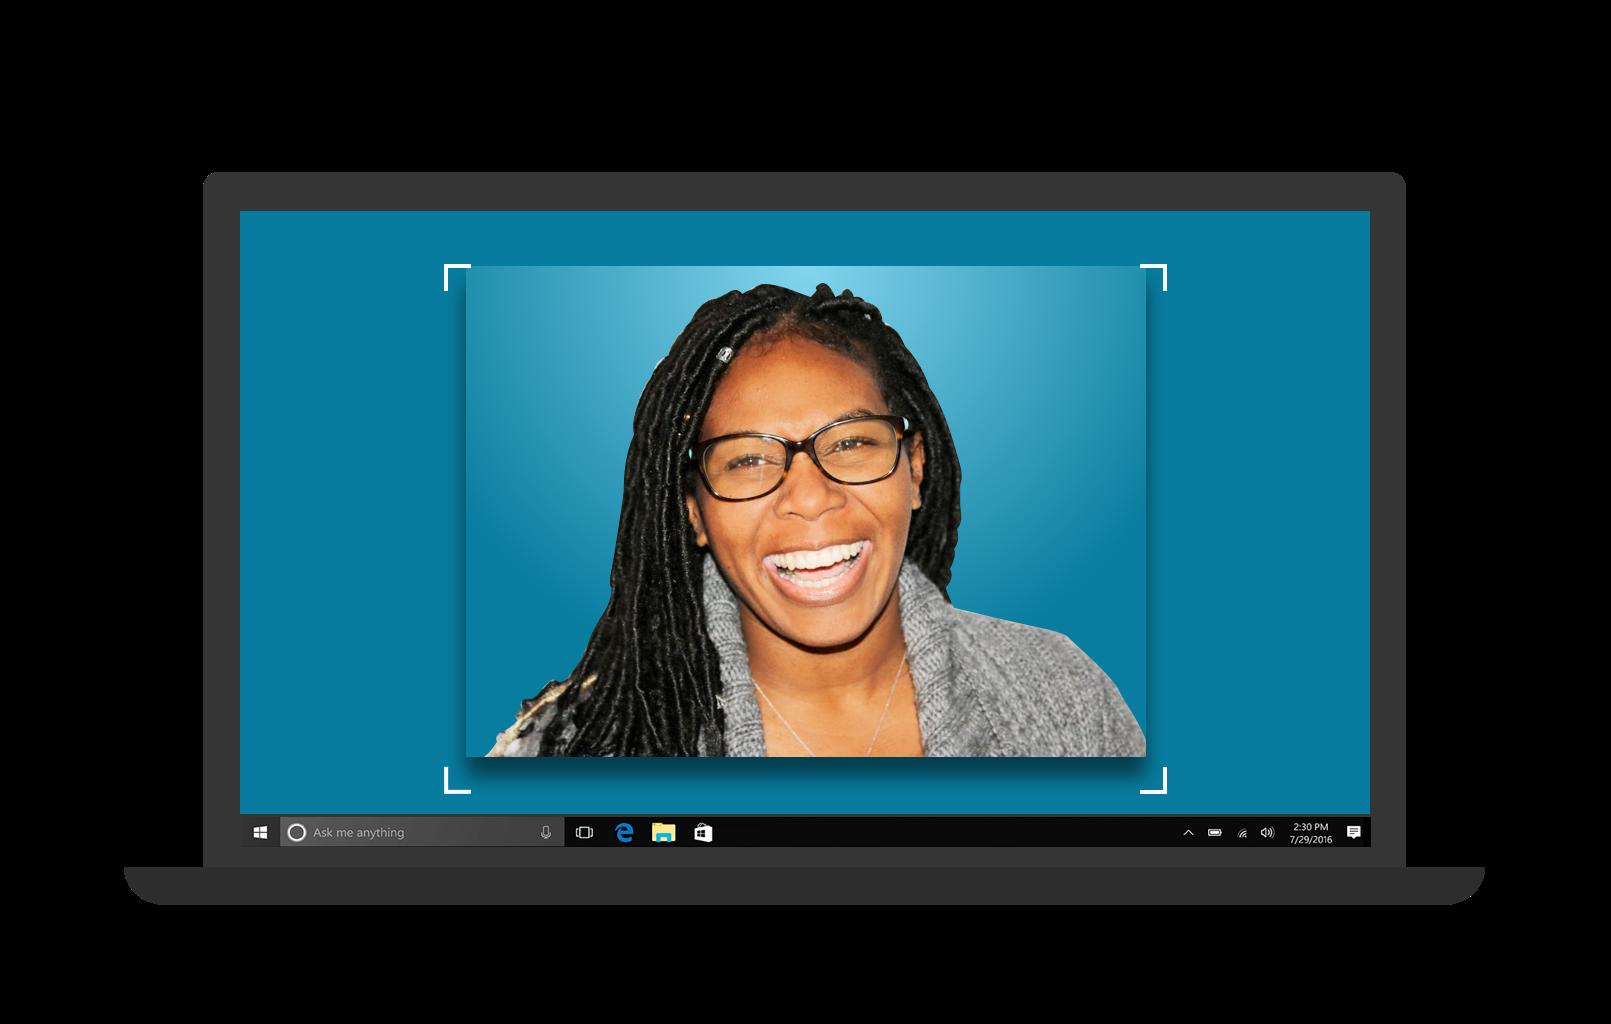 webcam recording software windows